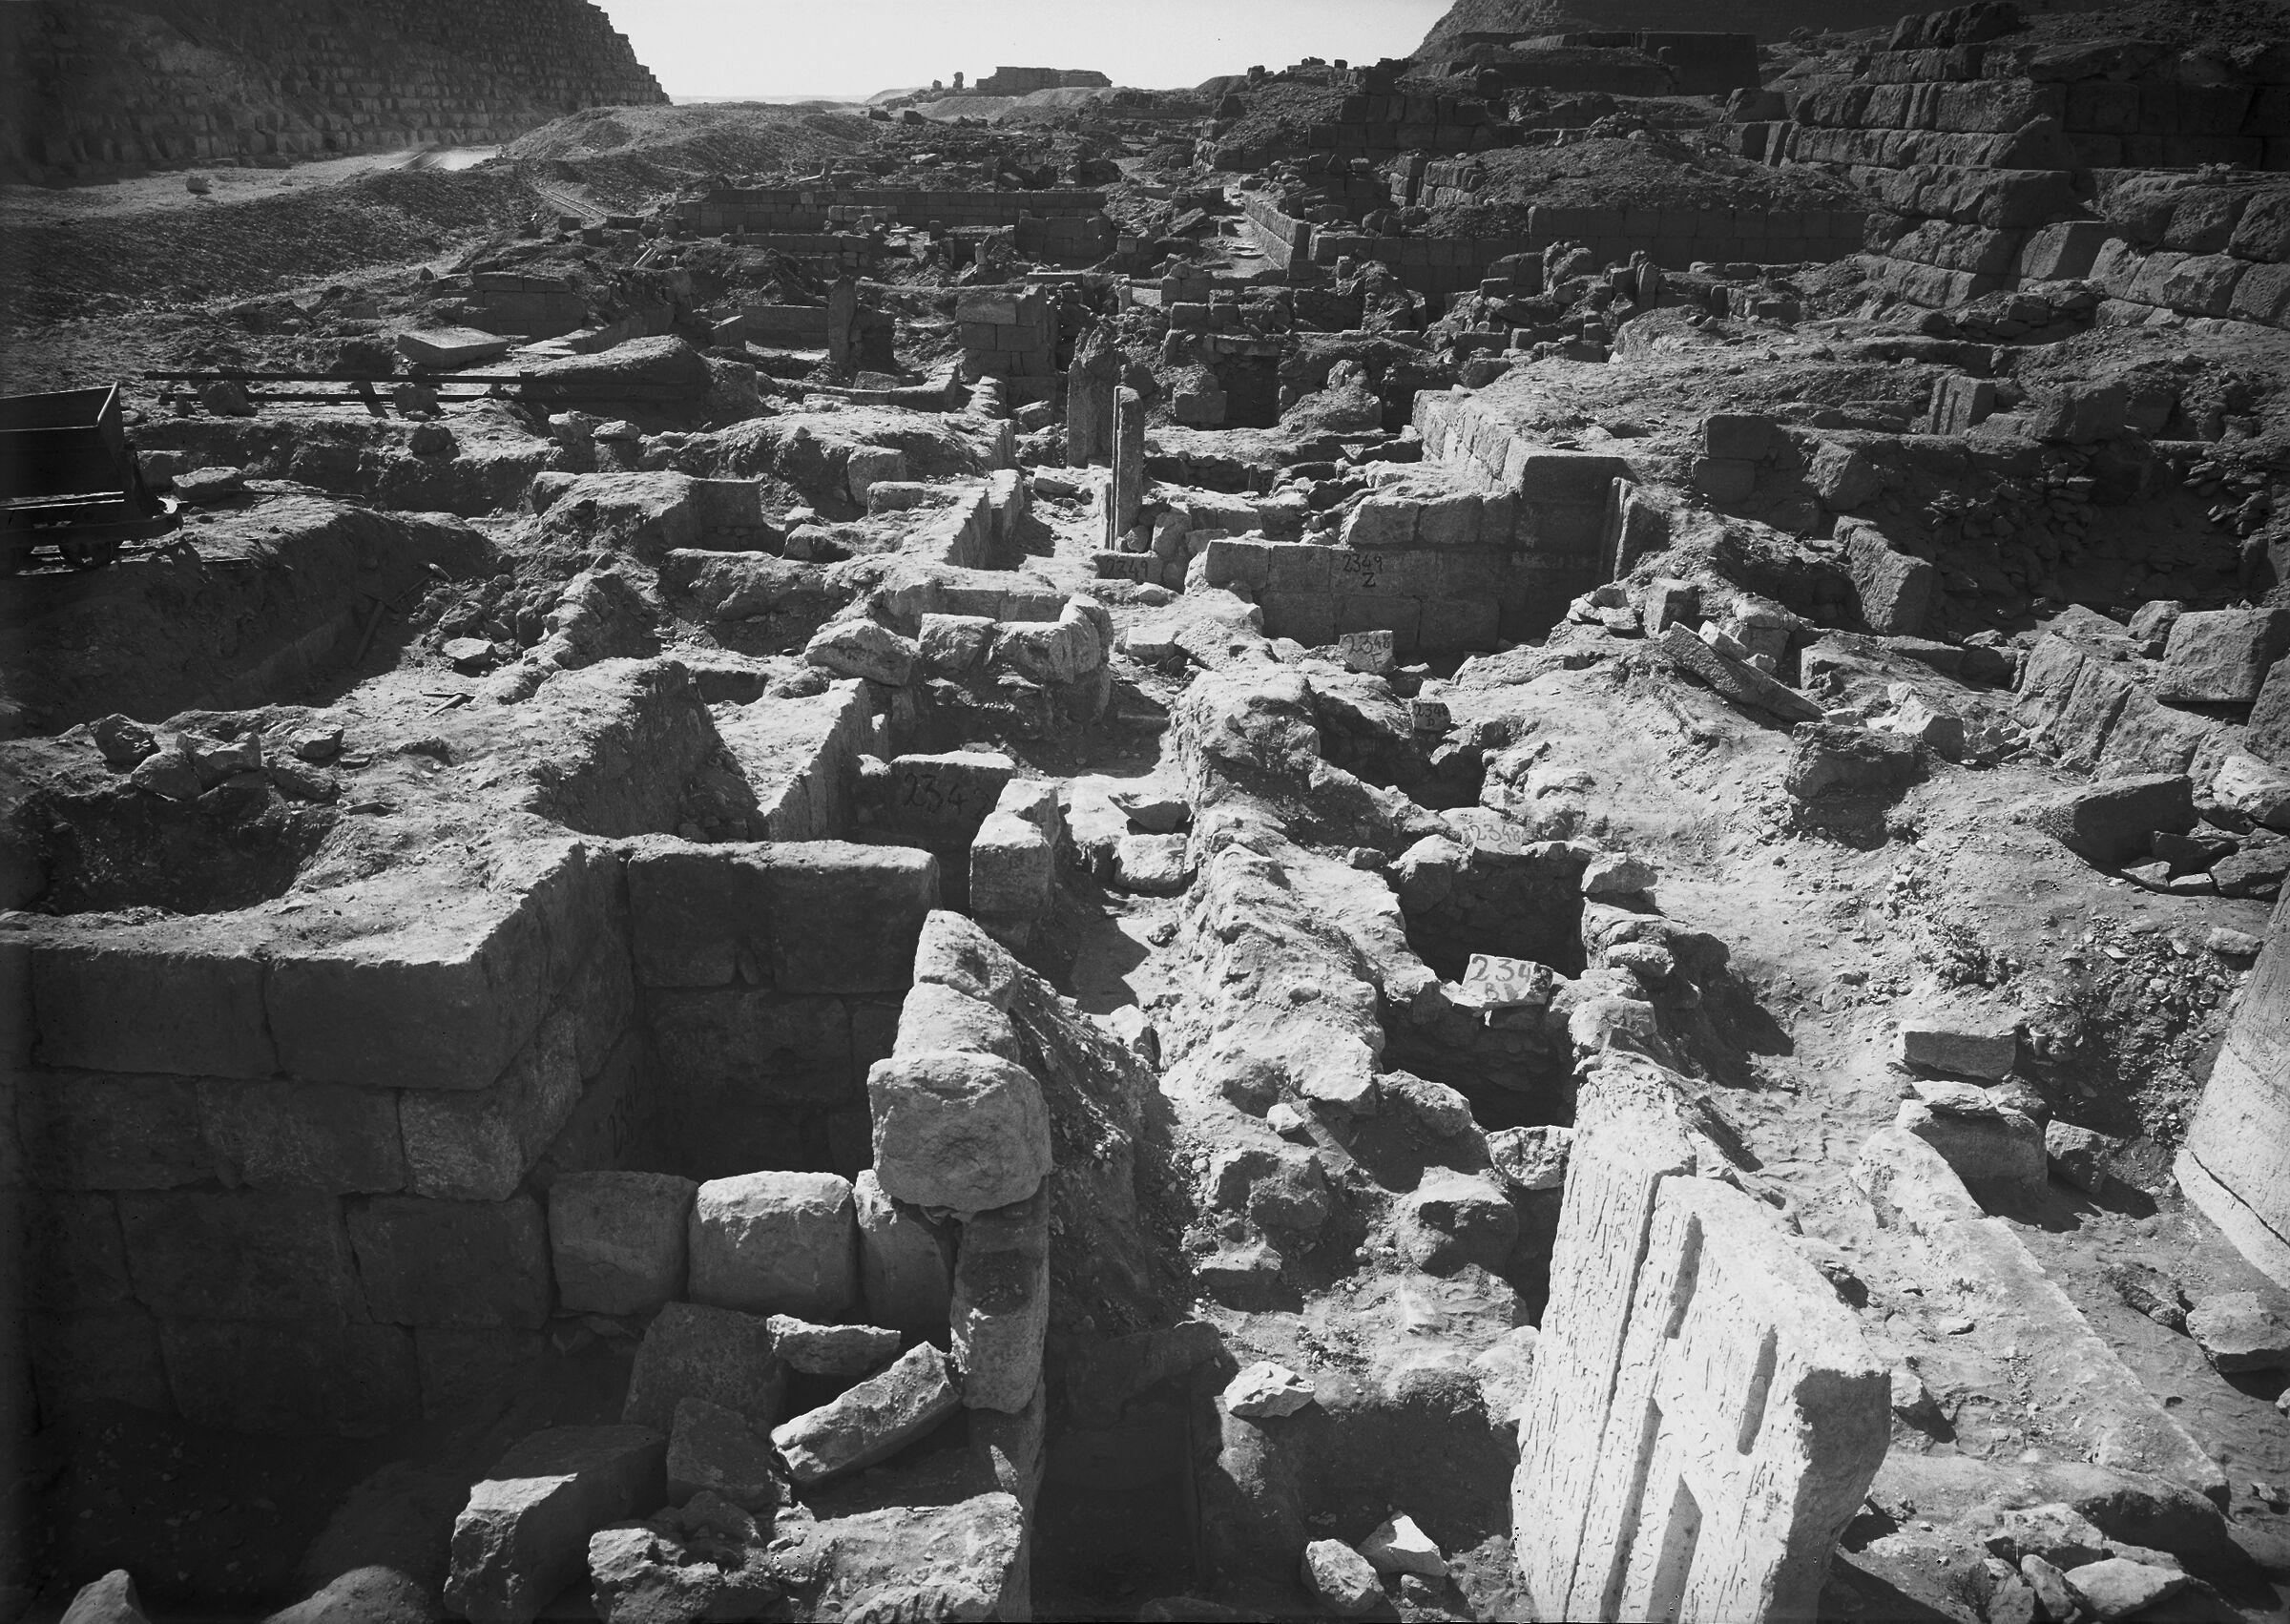 Western Cemetery: Site: Giza; View: G 2342 = G 5520, G 2343 = G 5511, G 5512, G 5510, G 2349 = G 5530